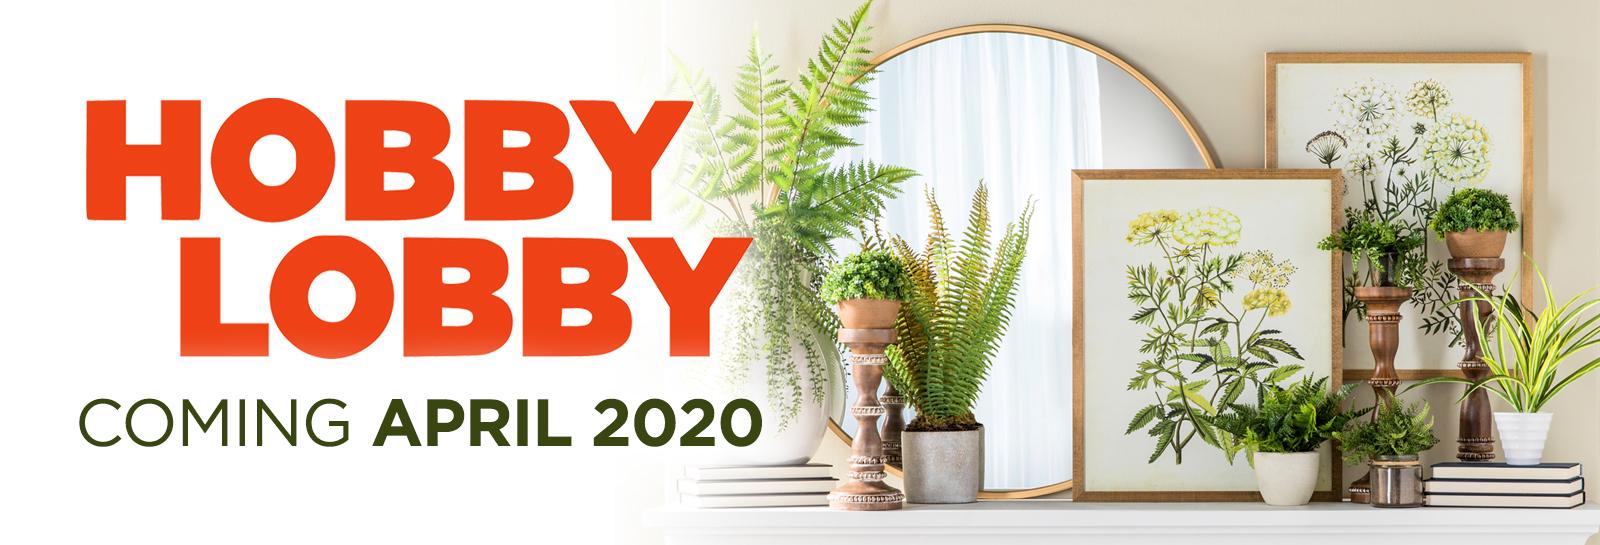 2020 02 12 hobby lobby Web slider